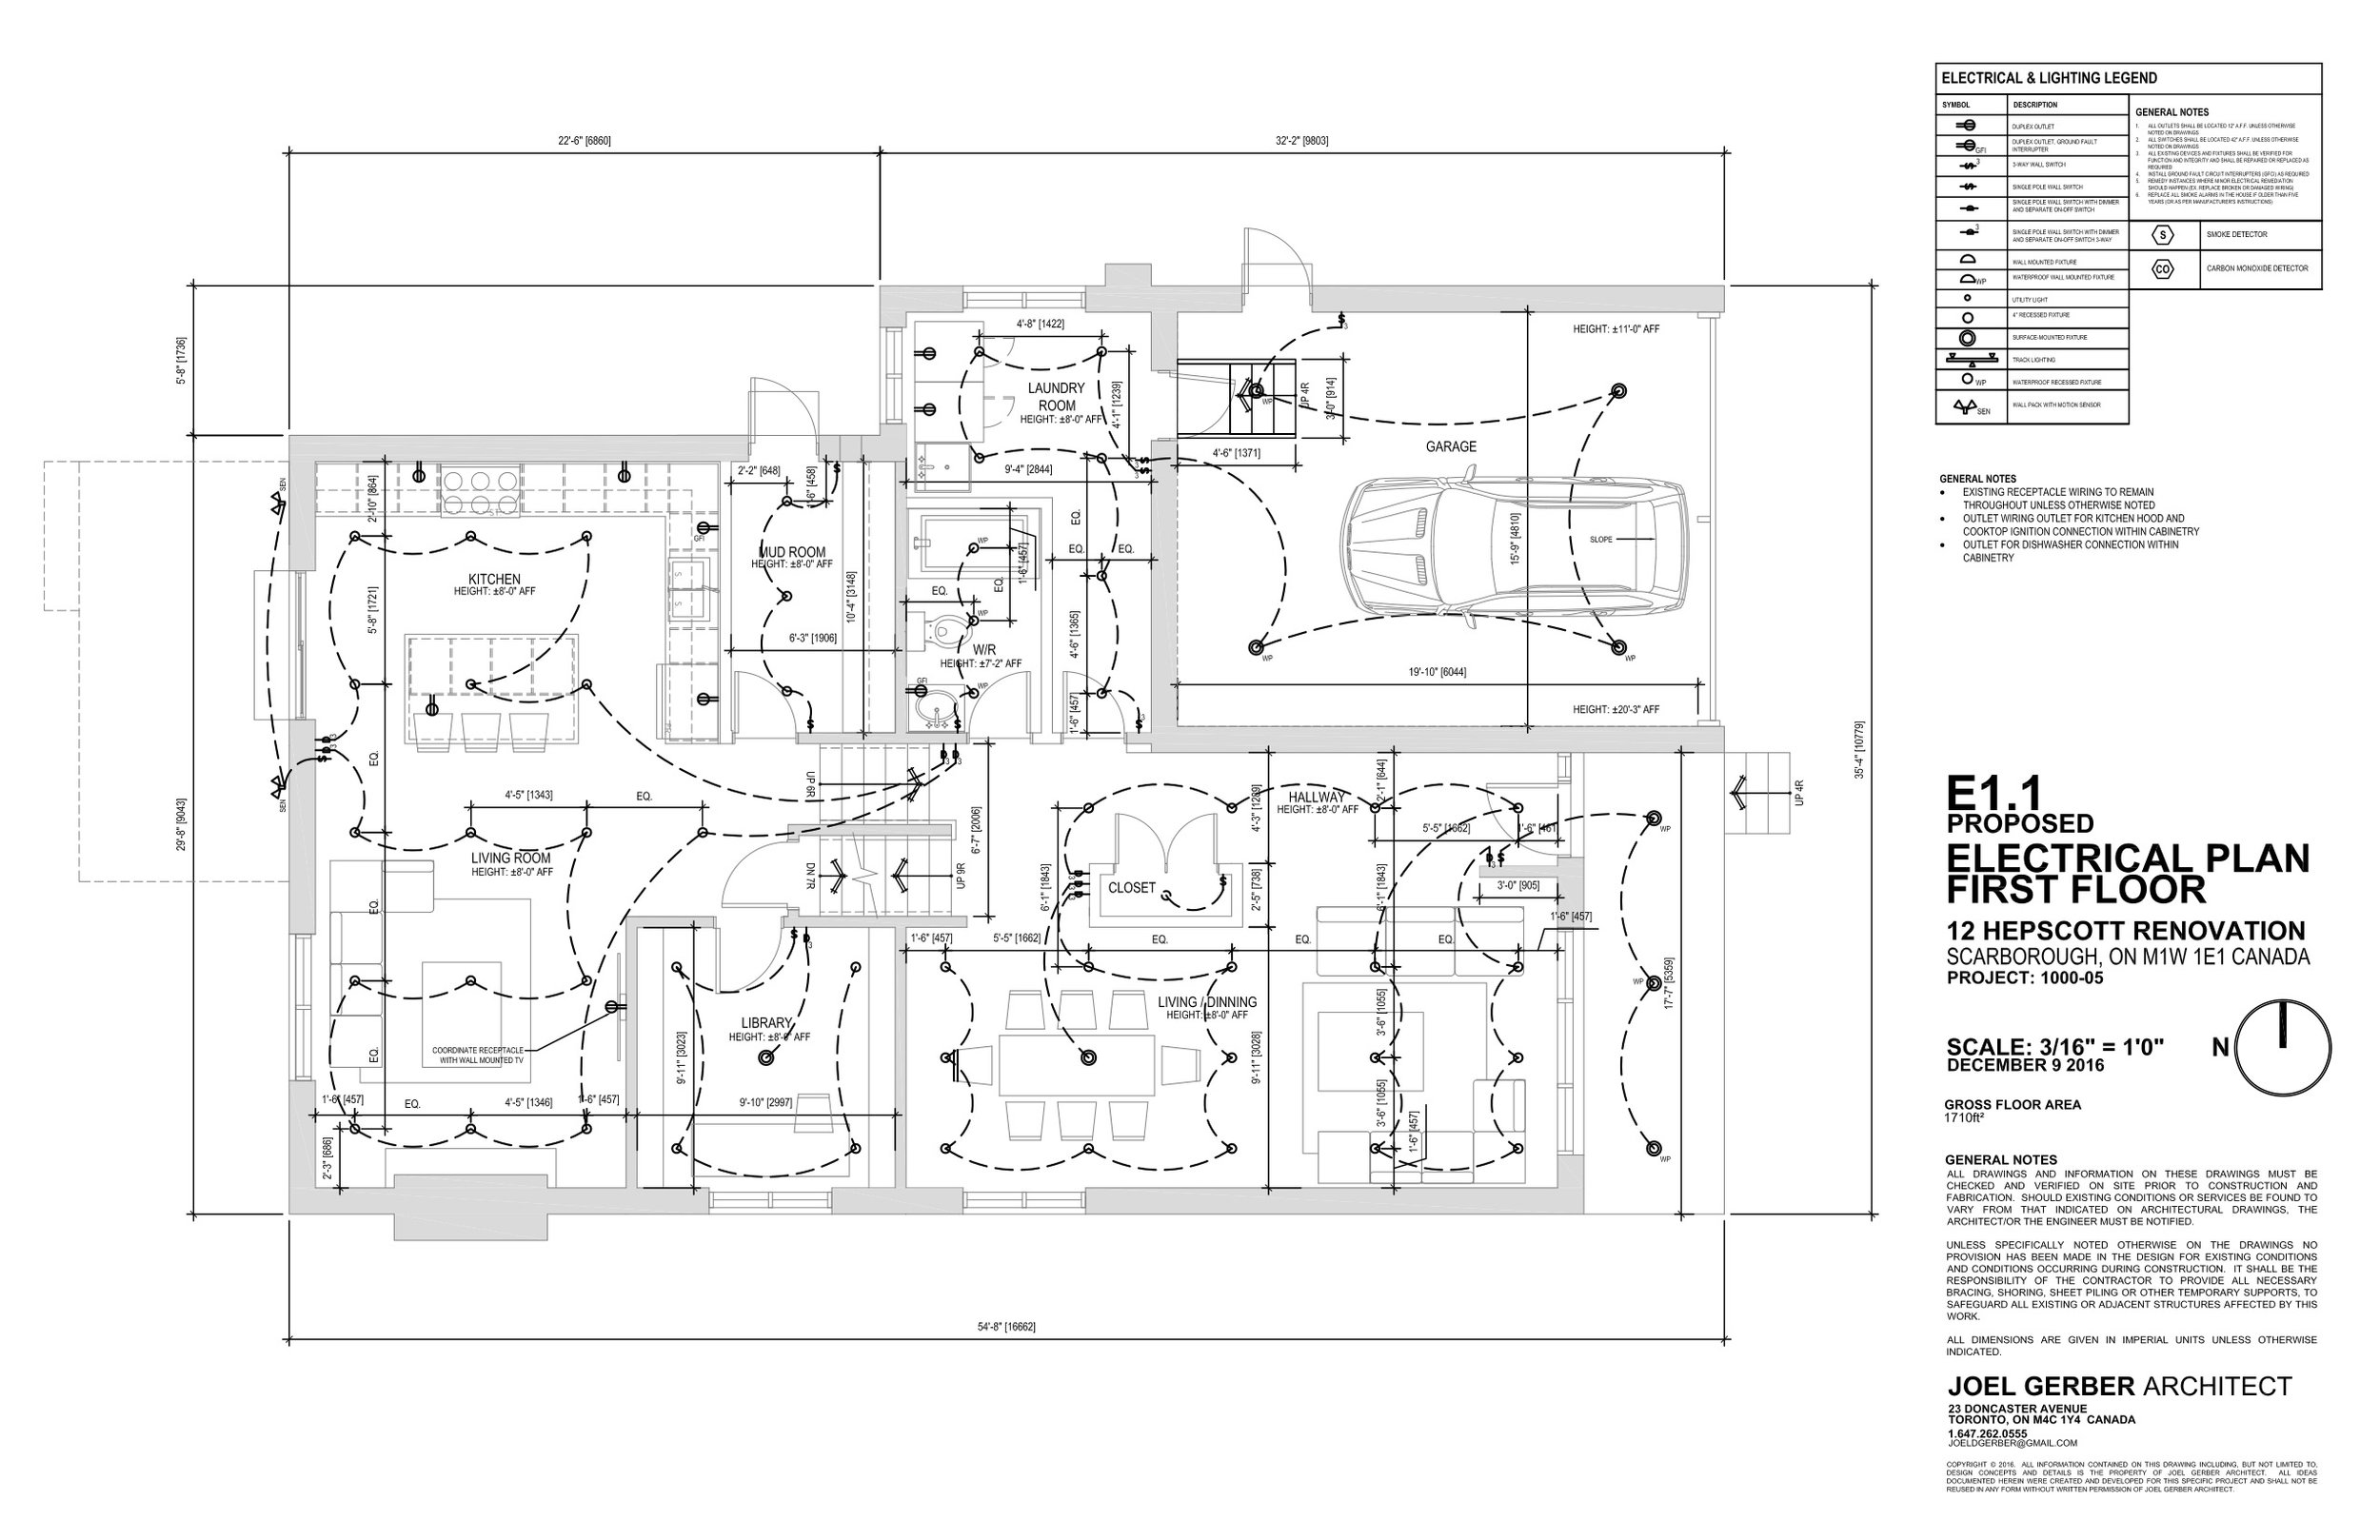 medium resolution of drawing electrical plan